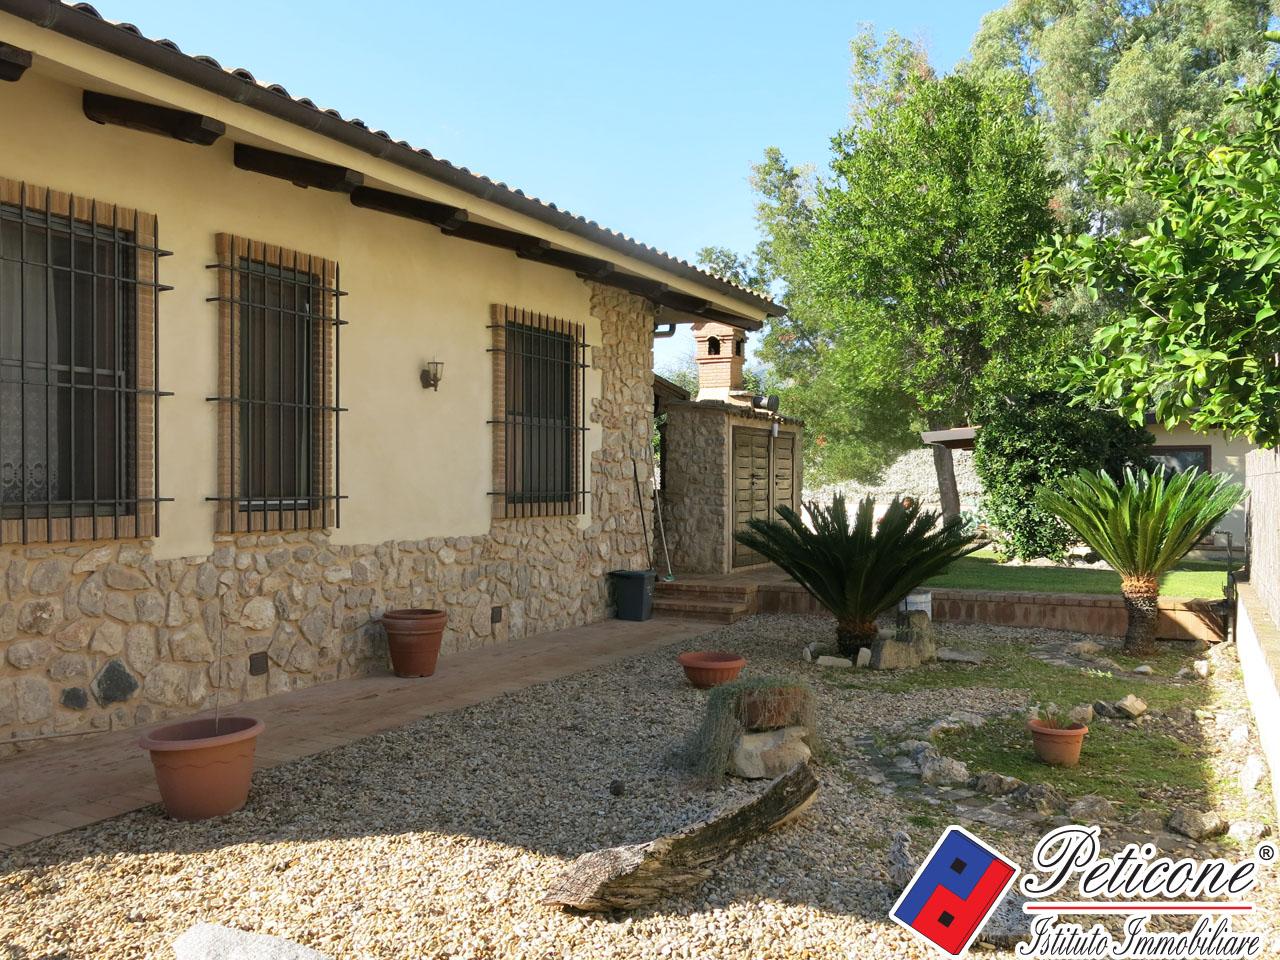 Villa in Vendita a Fondi: 3 locali, 107 mq - Foto 26